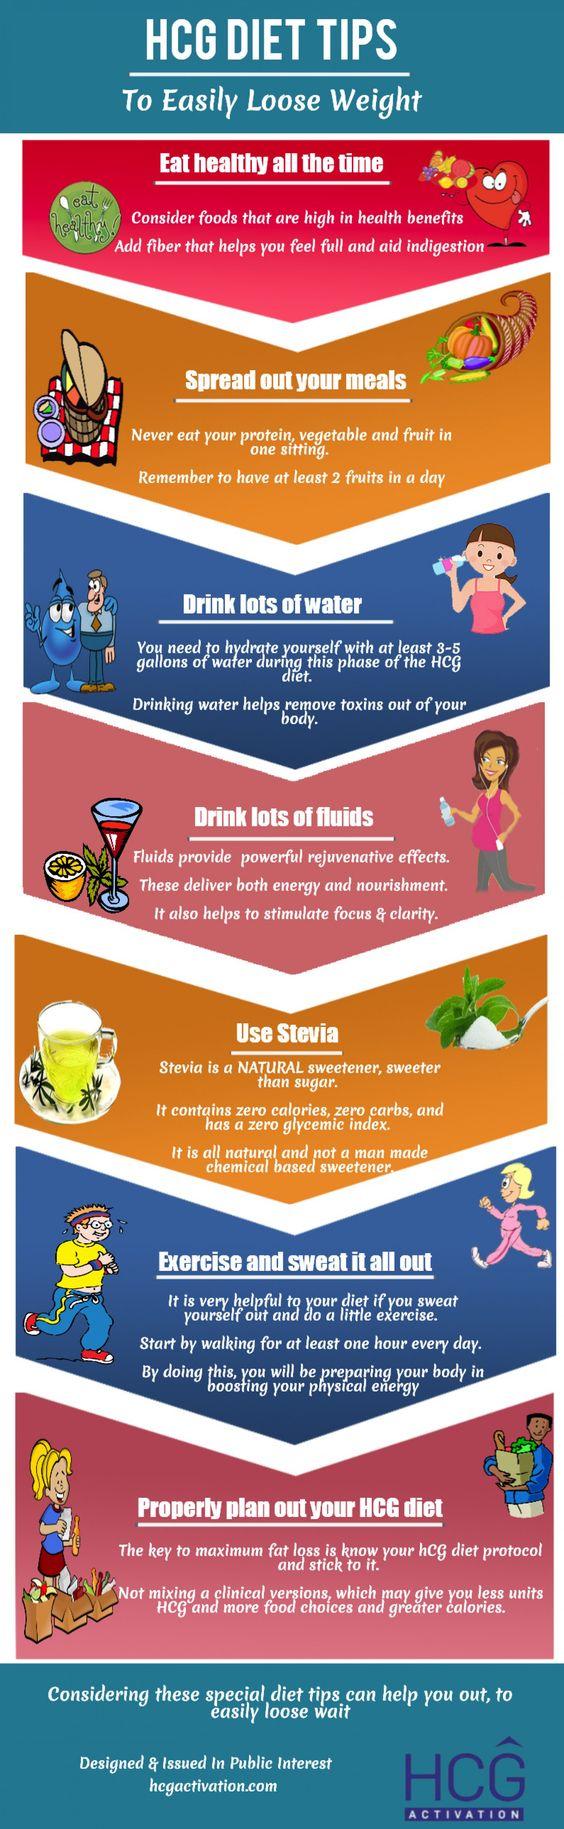 Hcg #Diet Tips #Infographic #Health